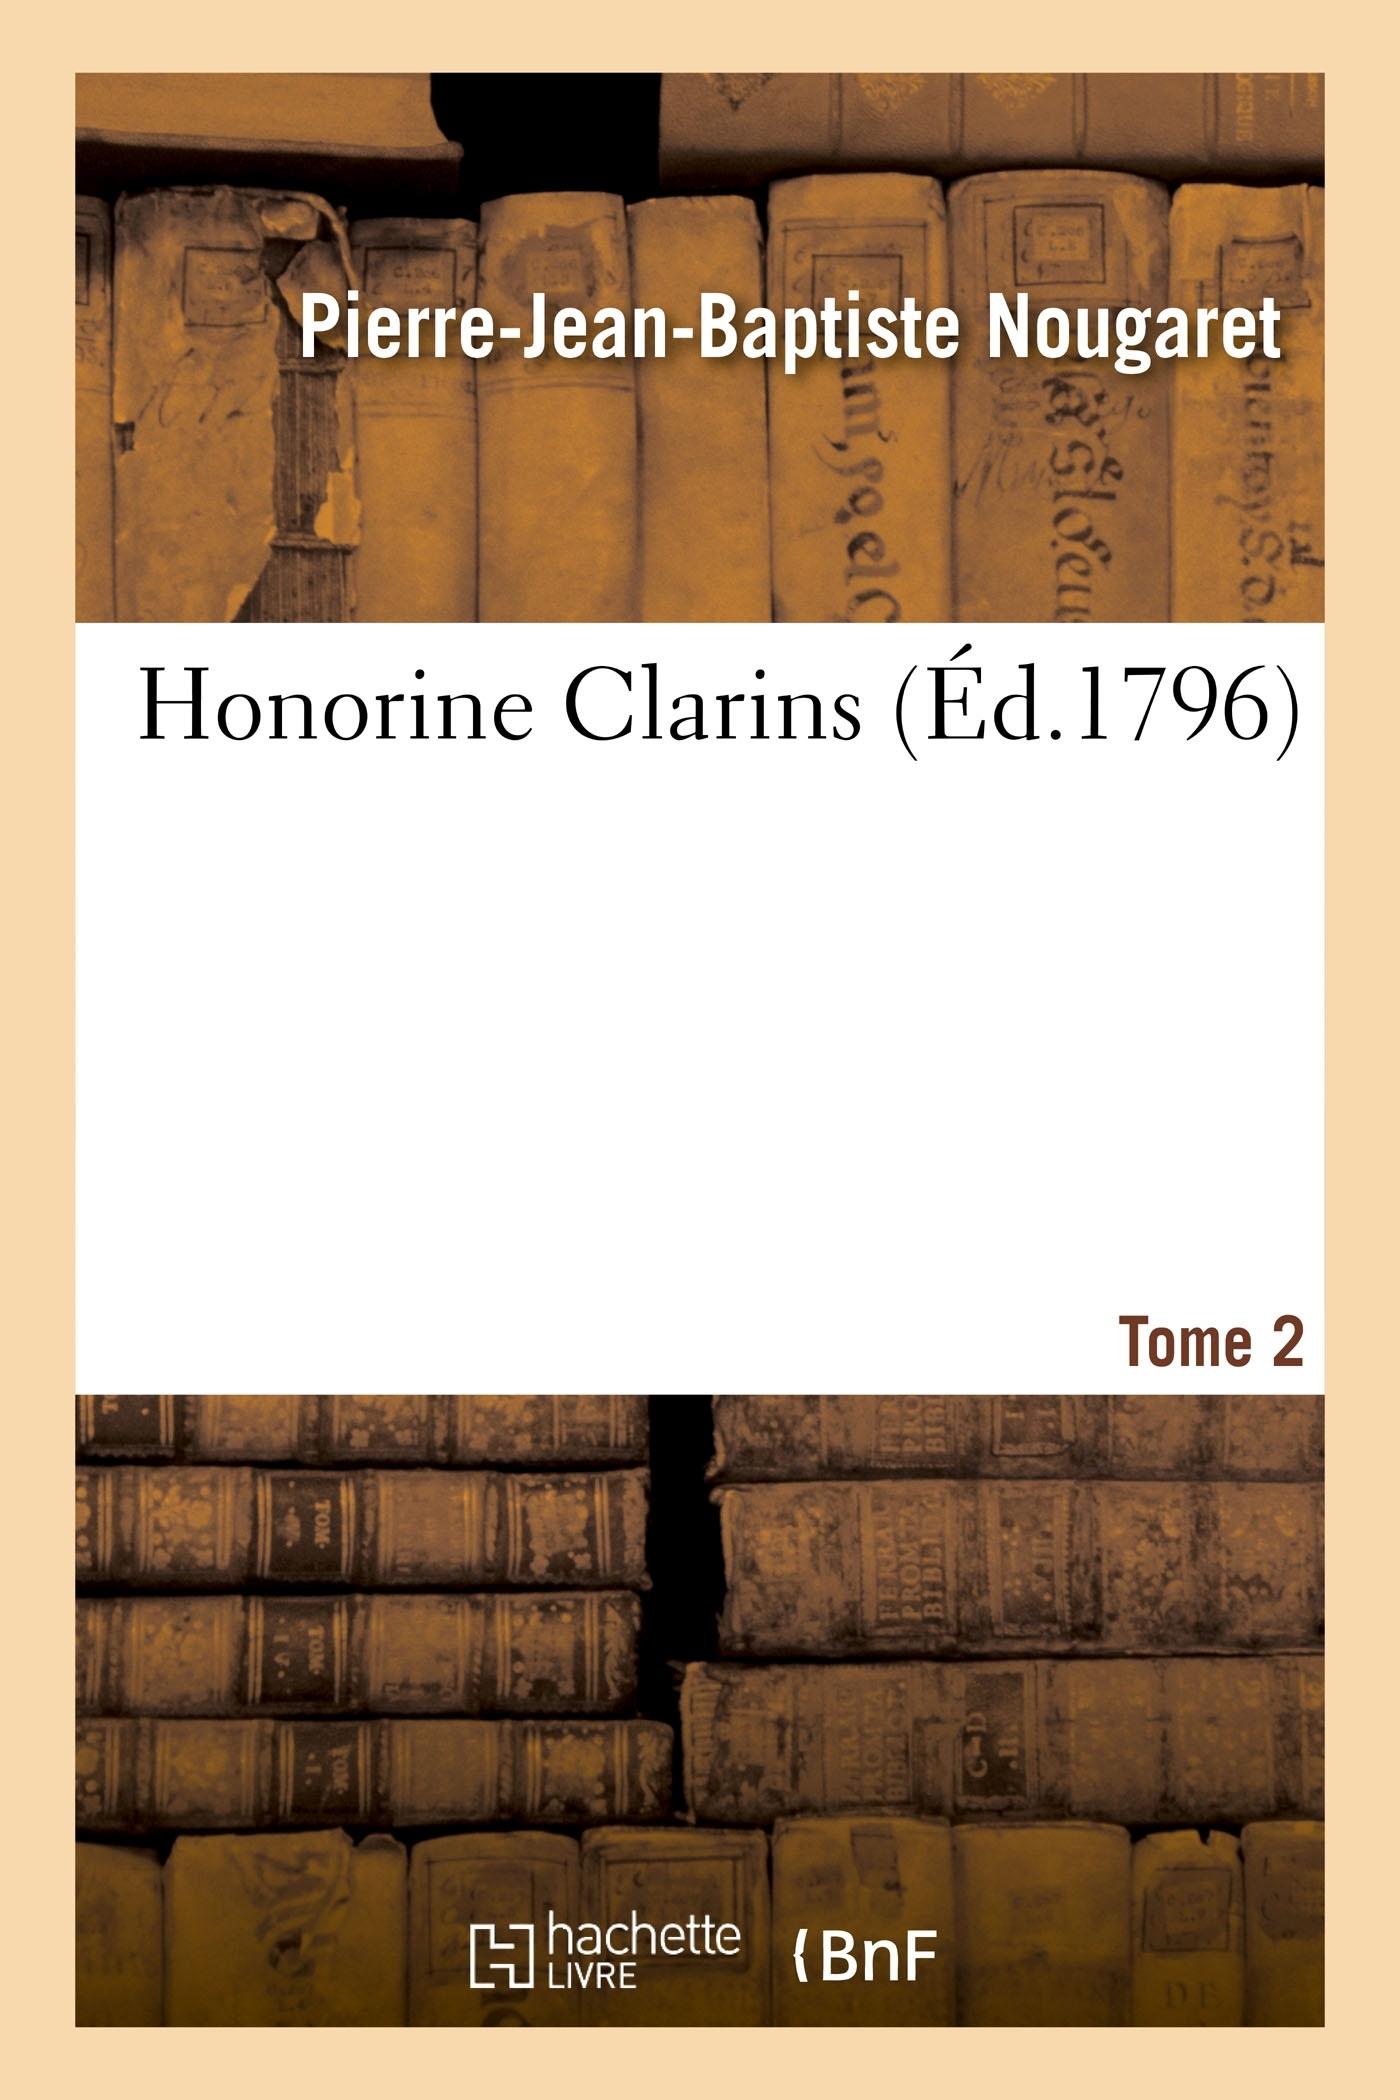 HONORINE CLARINS. TOME 2